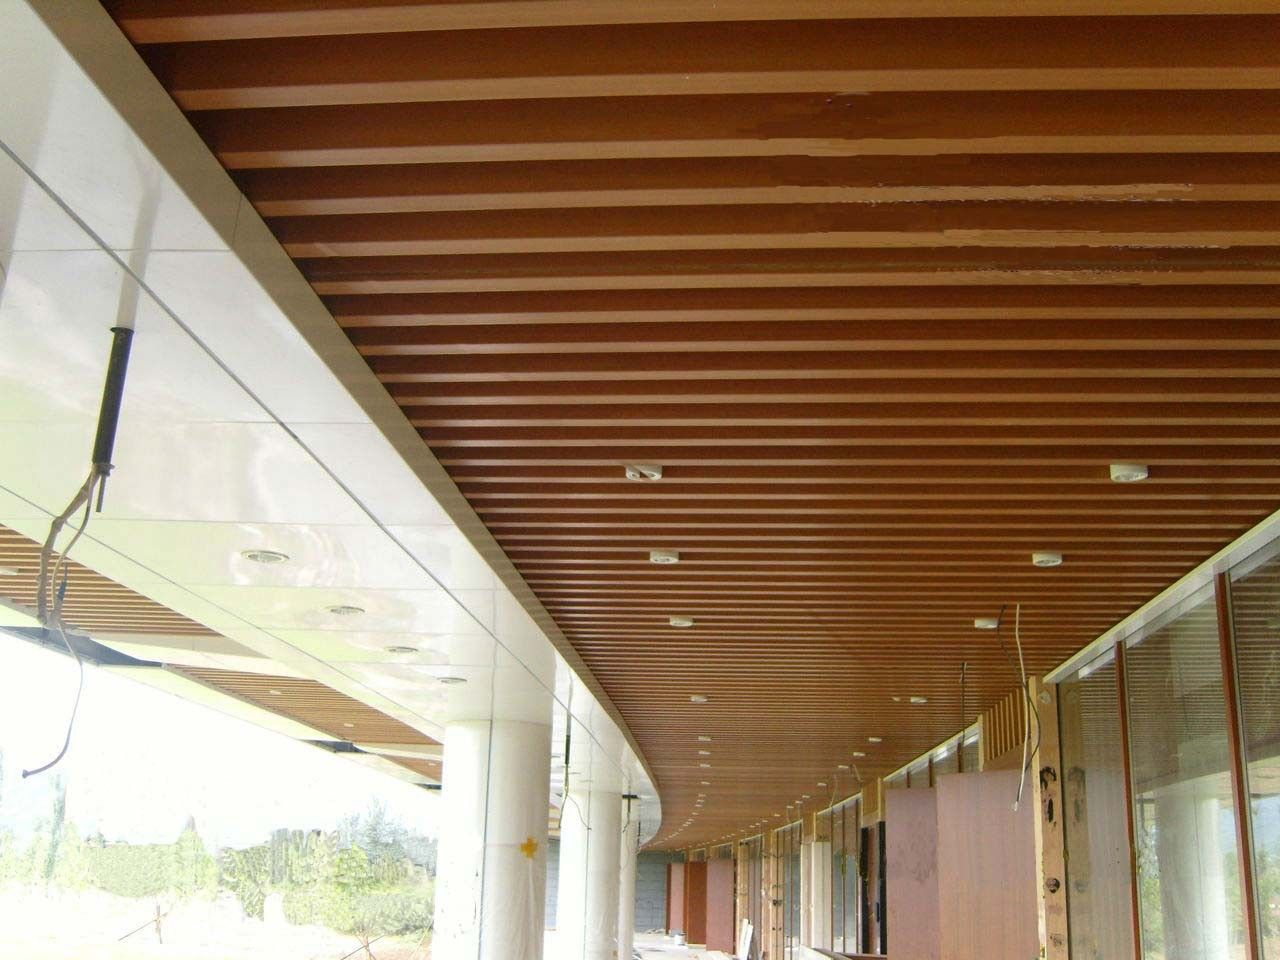 Modern Wood Ceiling Google Search Wood Ceiling Panels Ceiling Panels Wood Ceilings